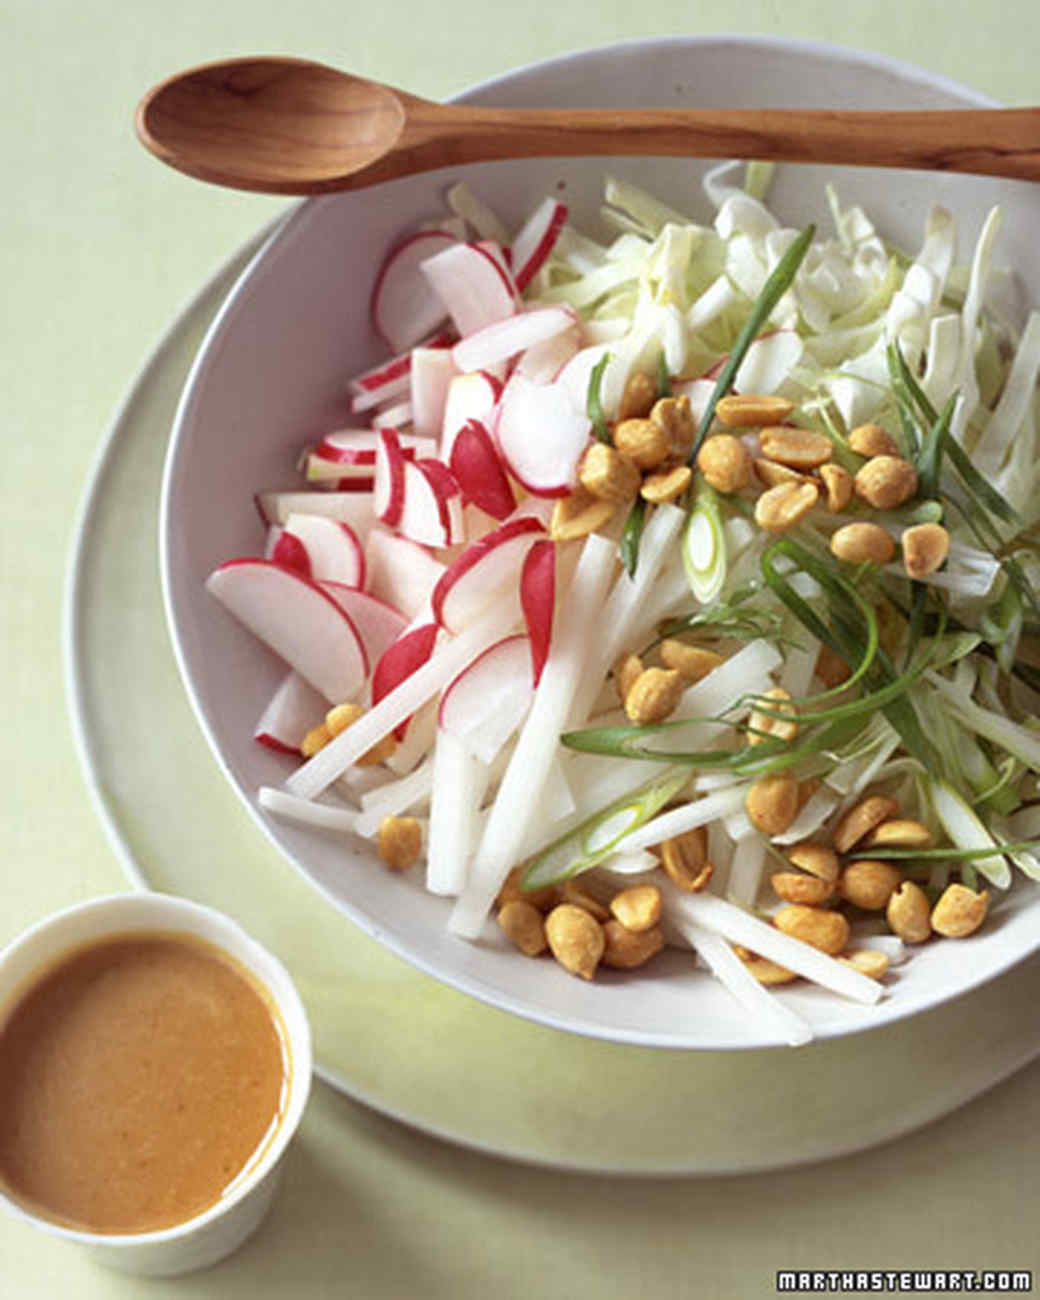 Cabbage and Radish Slaw with Peanut Dressing